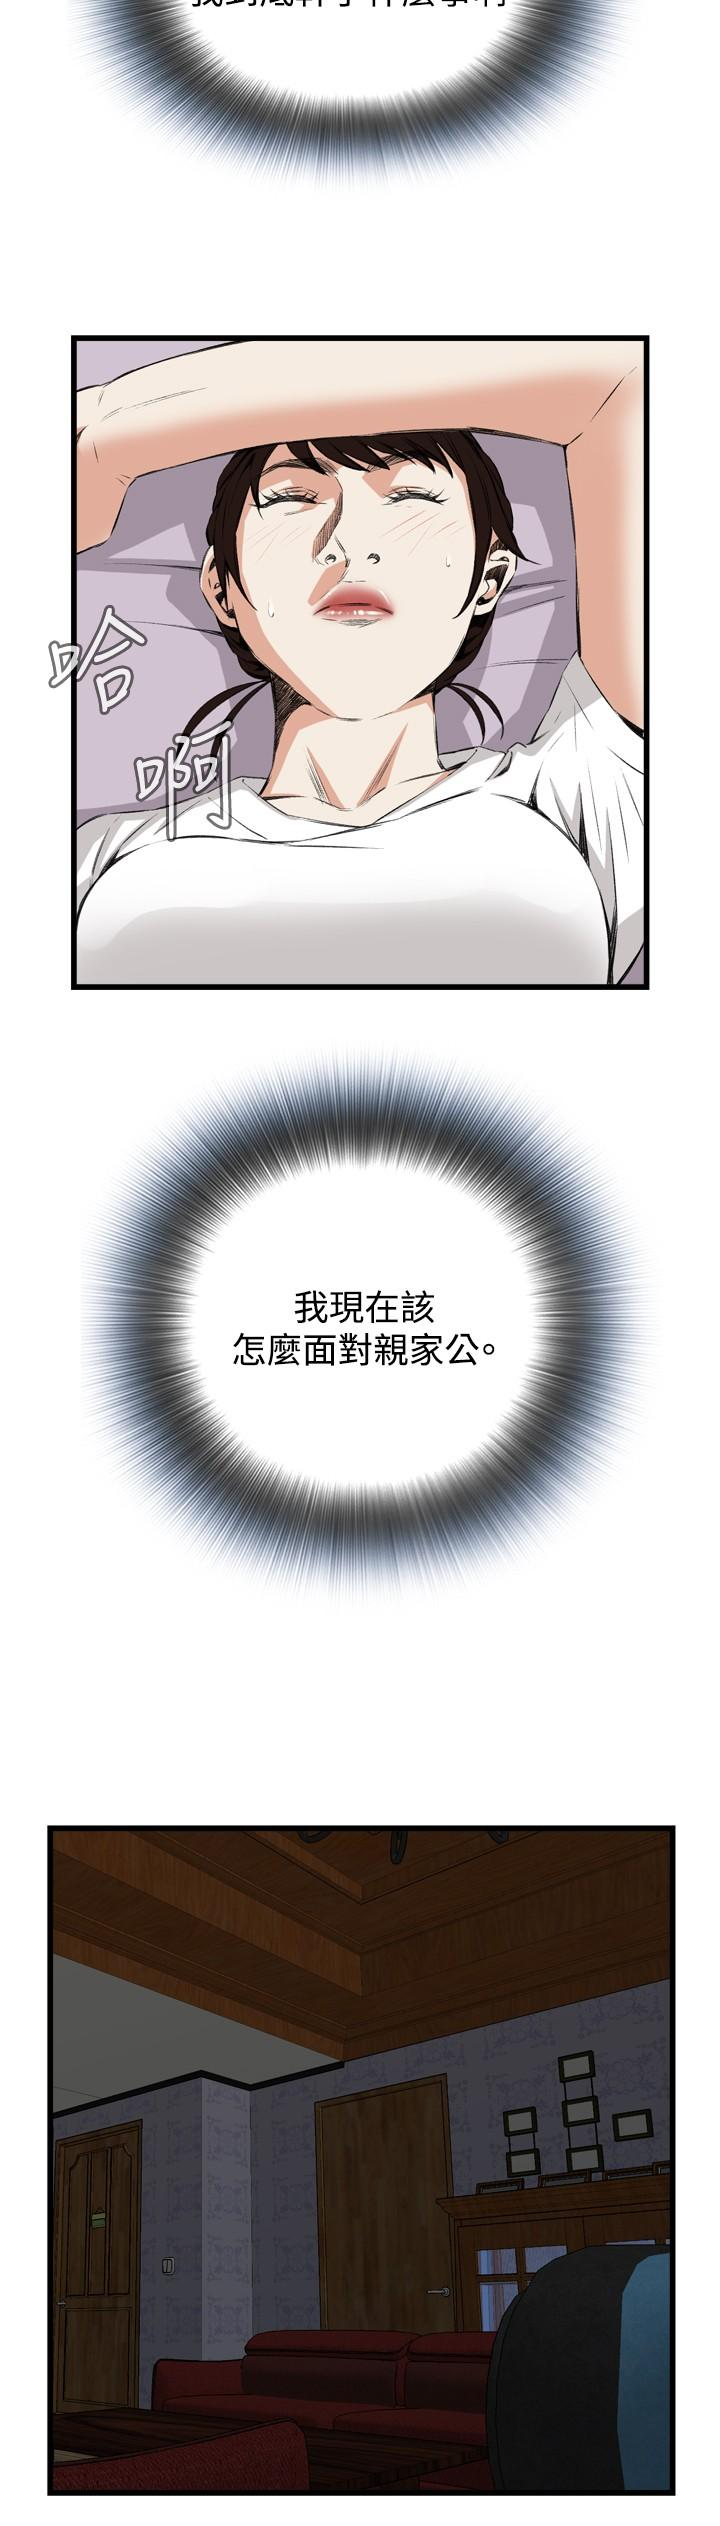 Take a Peek 偷窥 Ch.39~60 [Chinese]中文 386